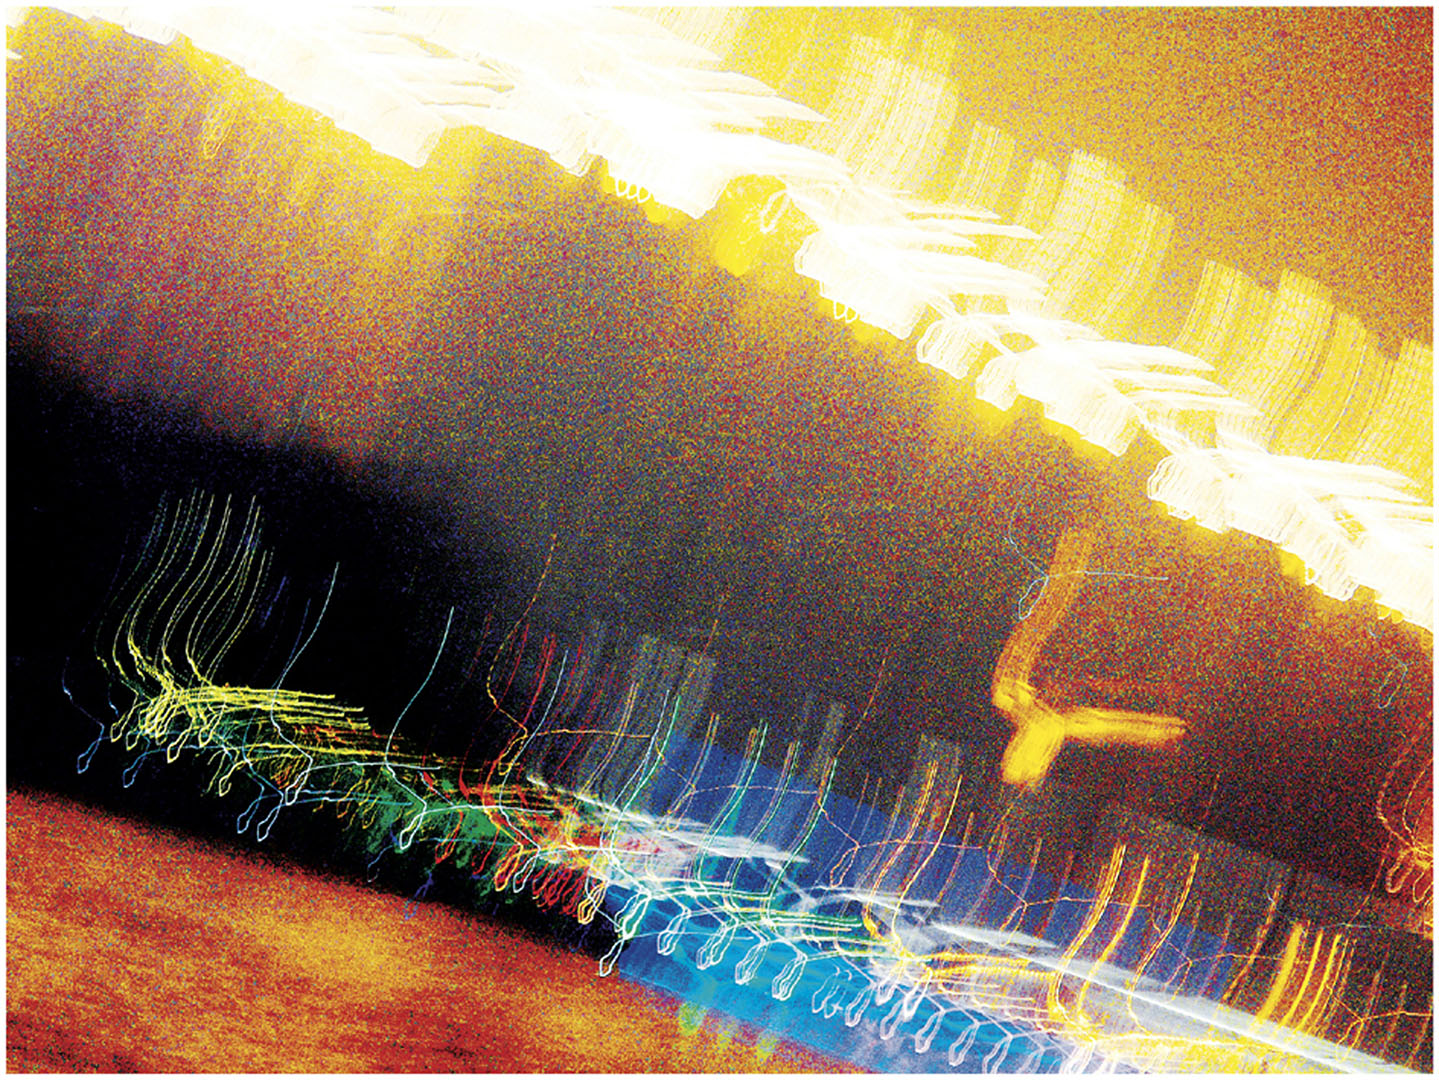 Light_Paintings_027_AXYA88